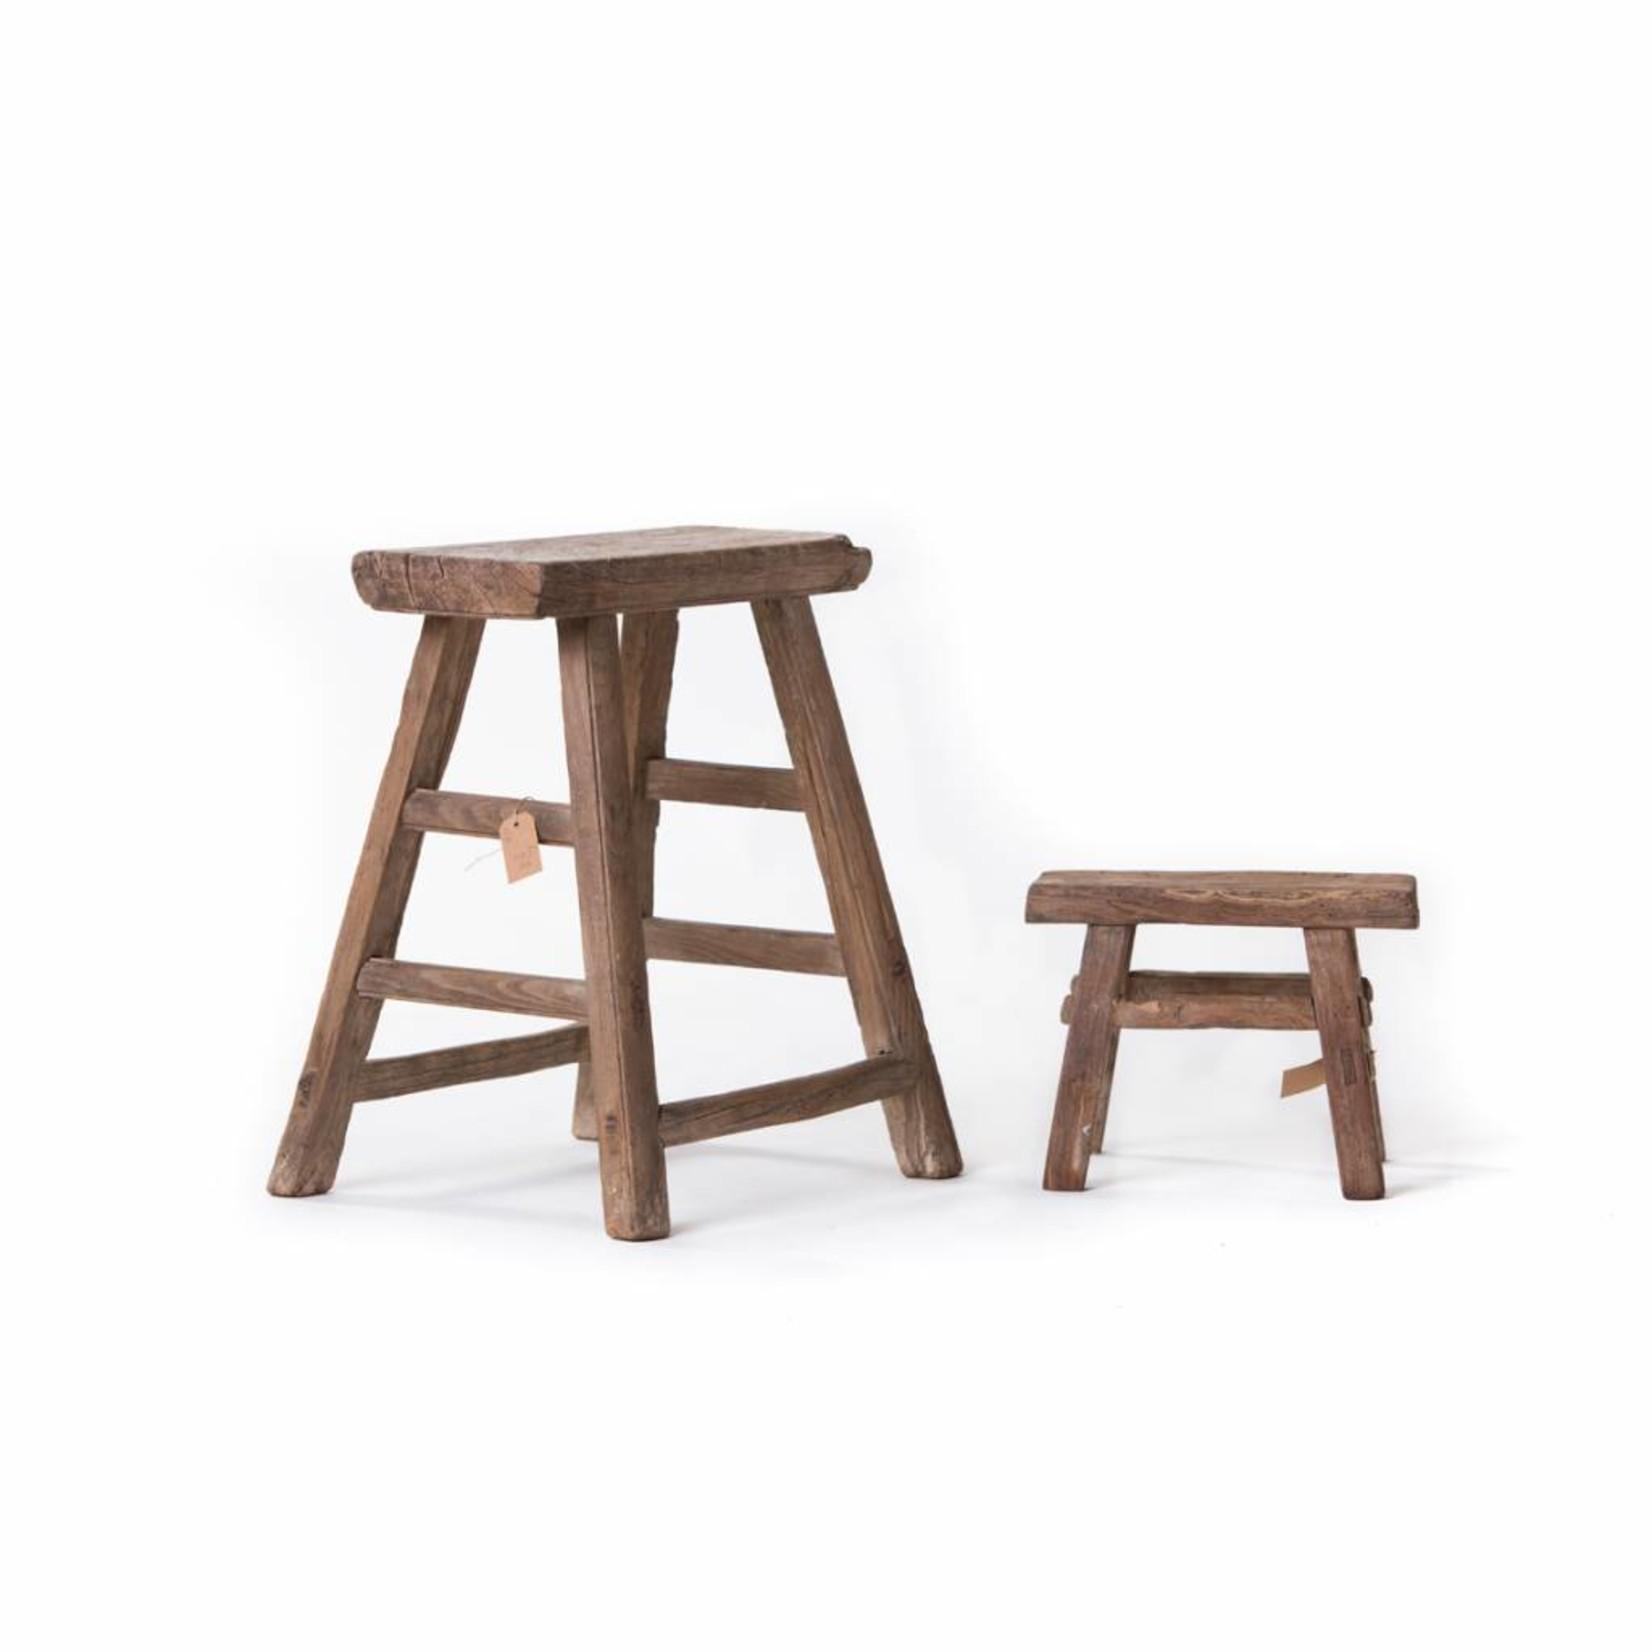 Prachtige set van oude houten kruk en kleine melkkrukje(s)